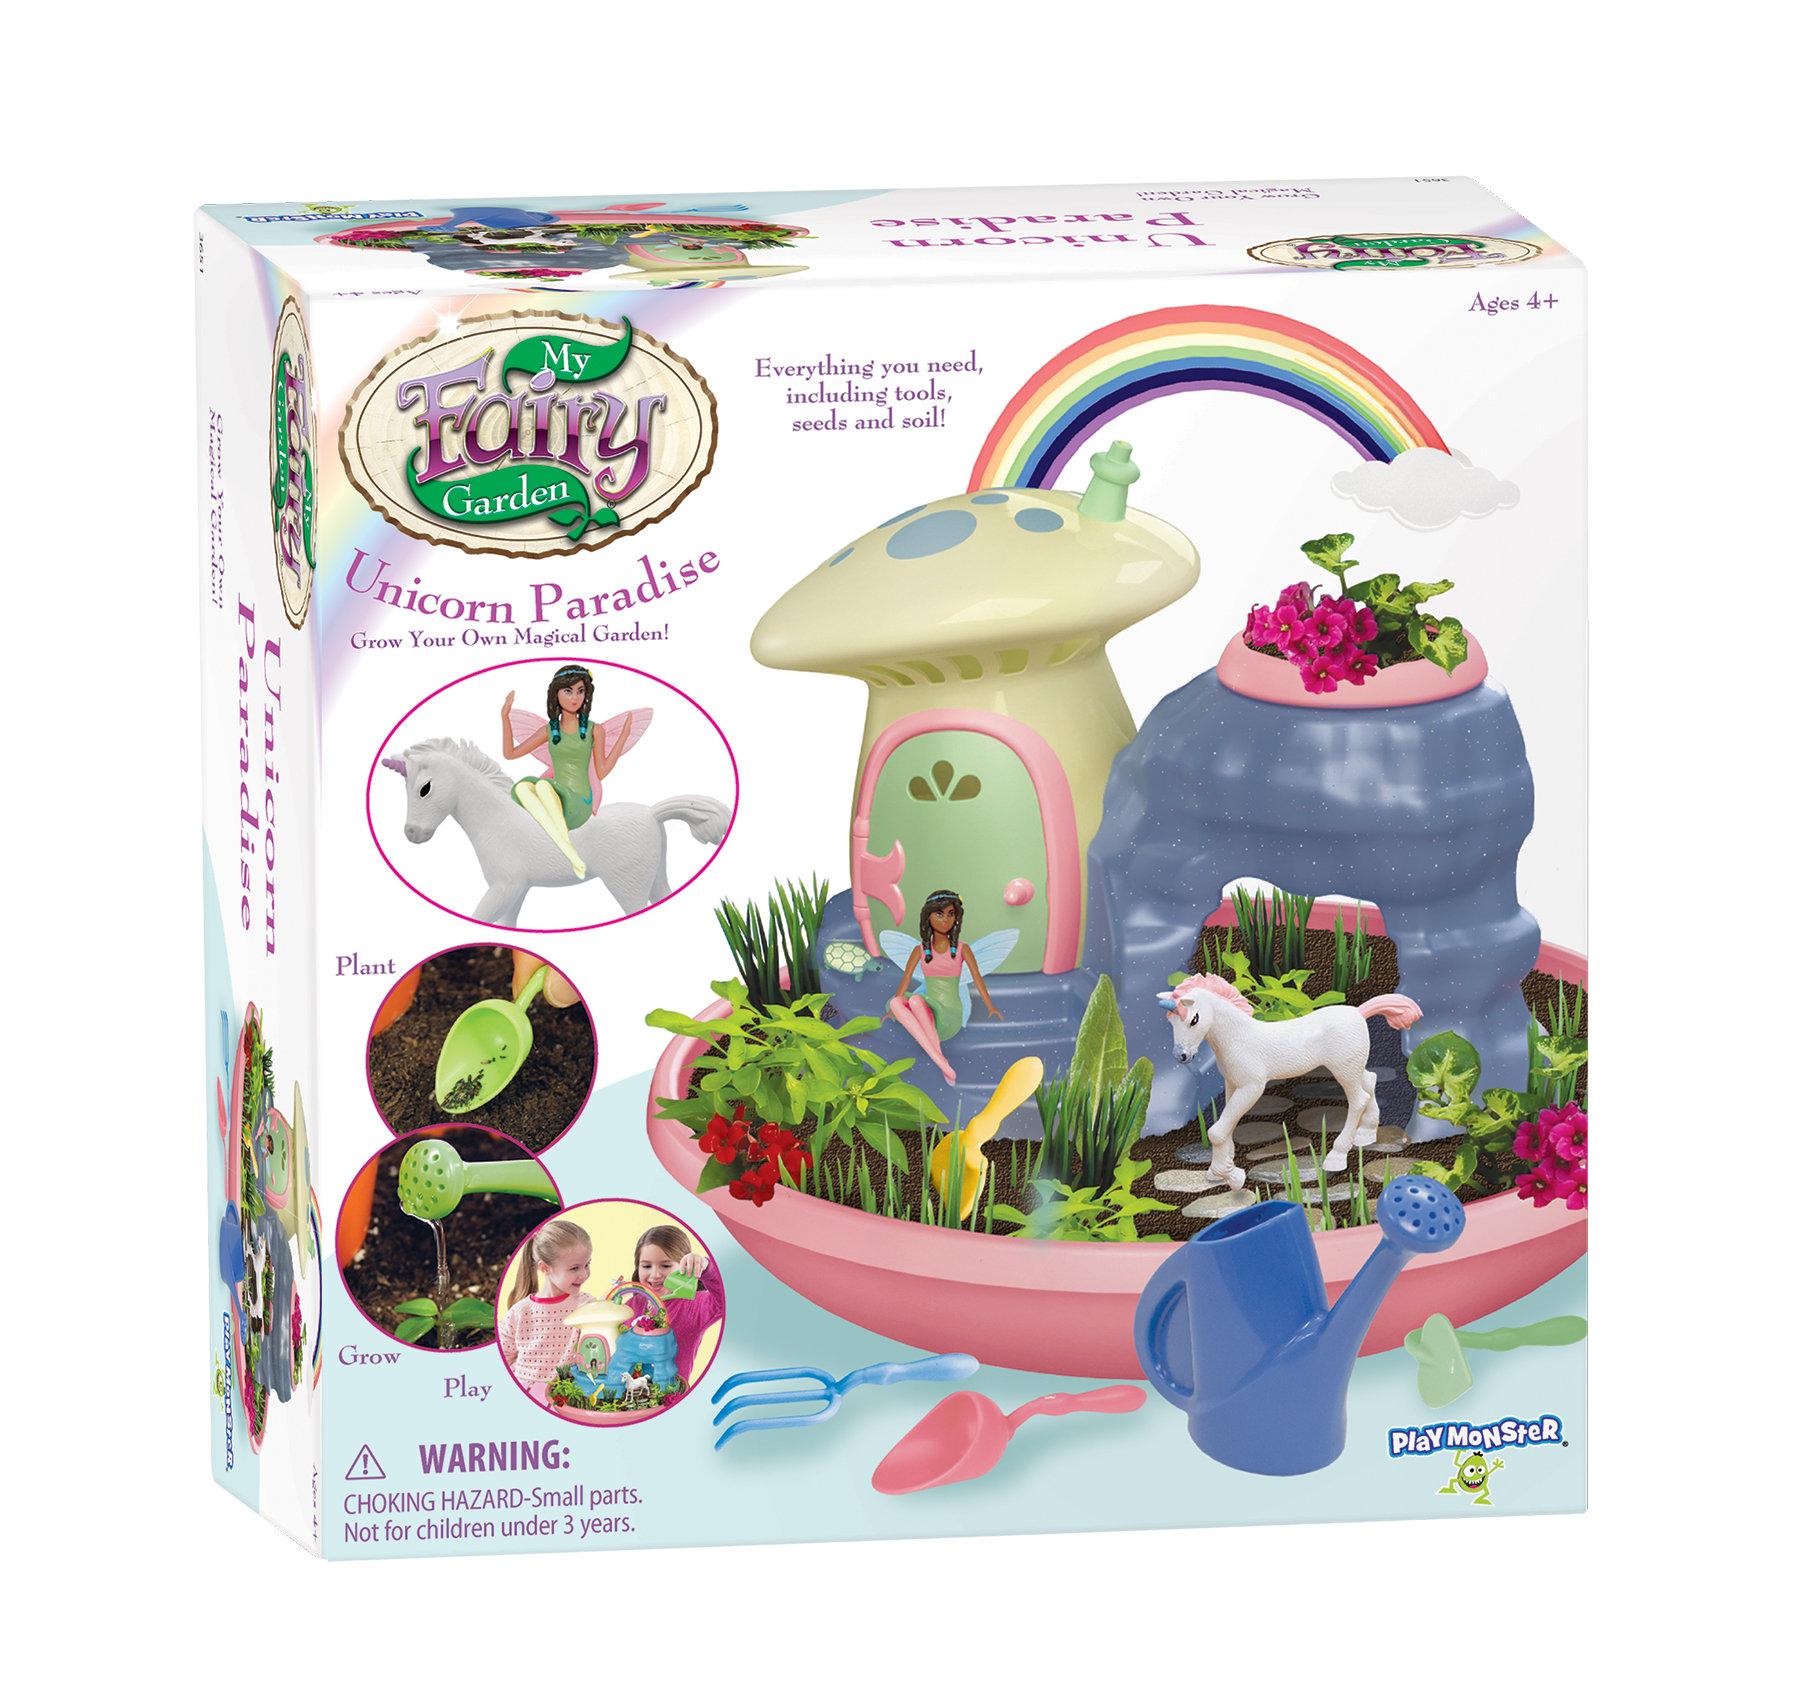 My Fairy Garden Unicorn Paradise Playmonster